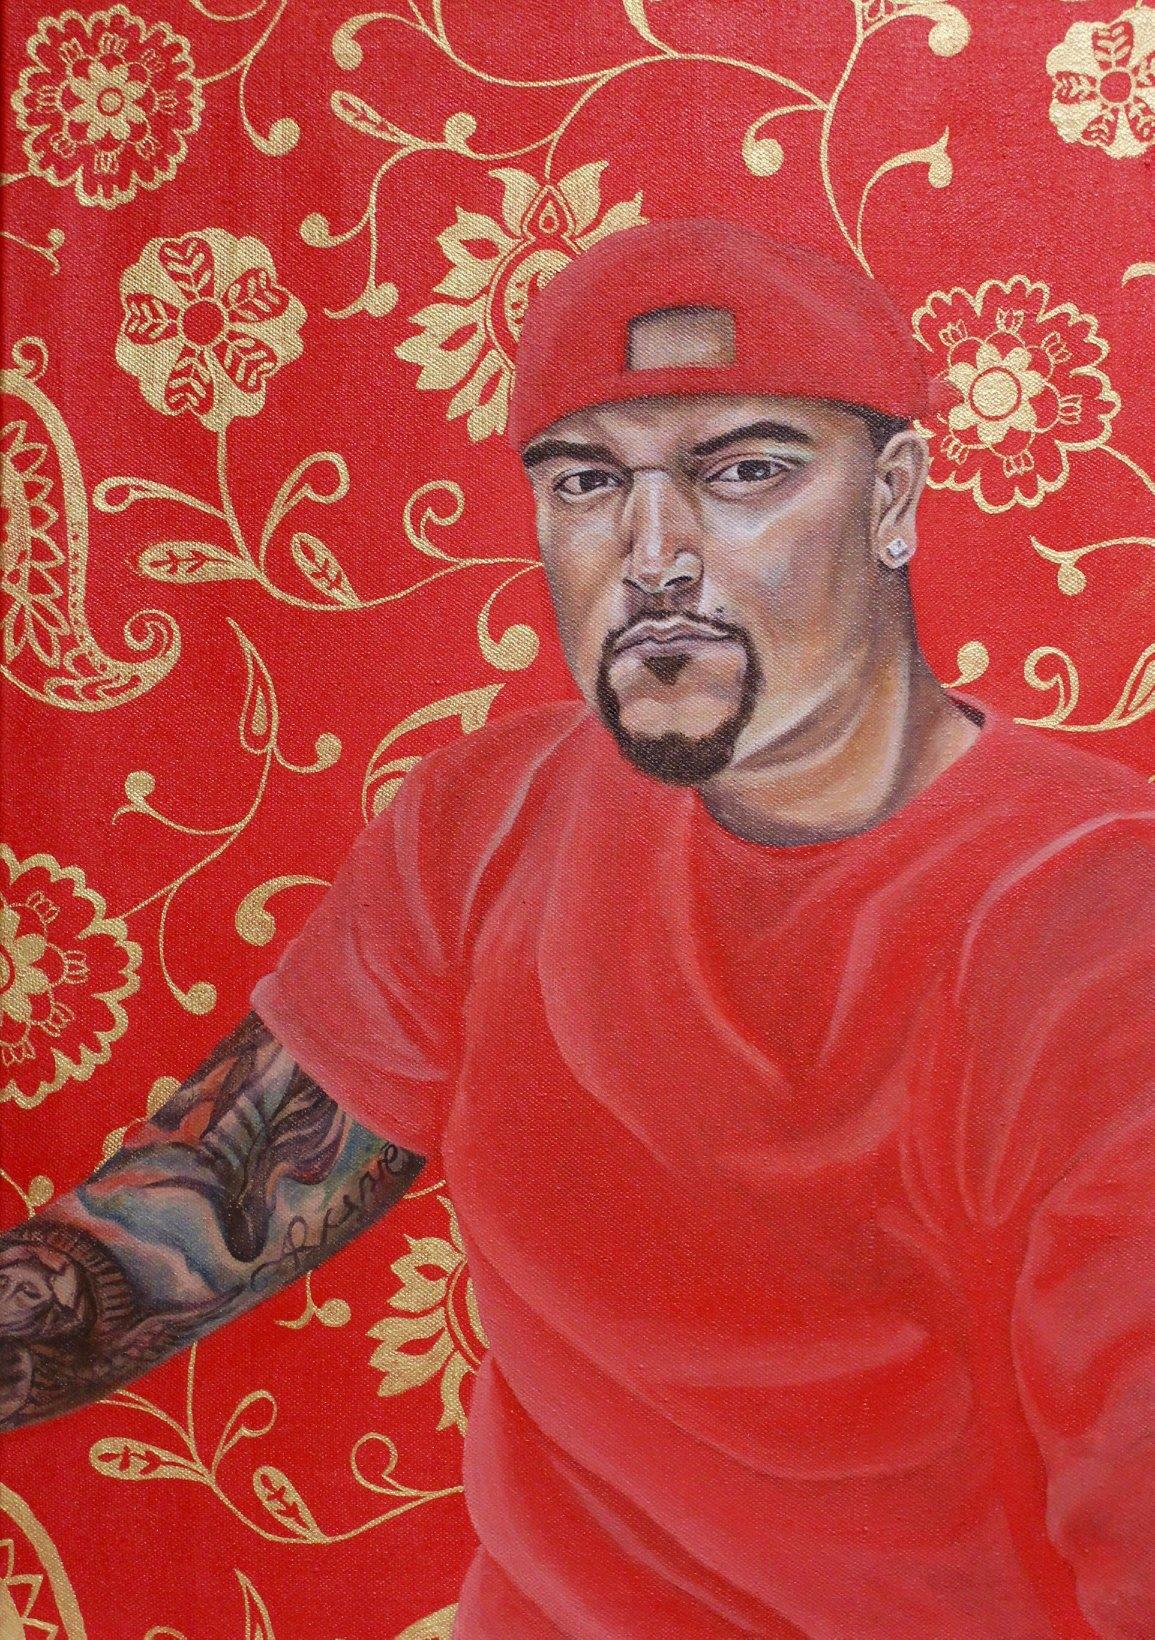 Angel Enrique Bermudez by Corinne Holloway